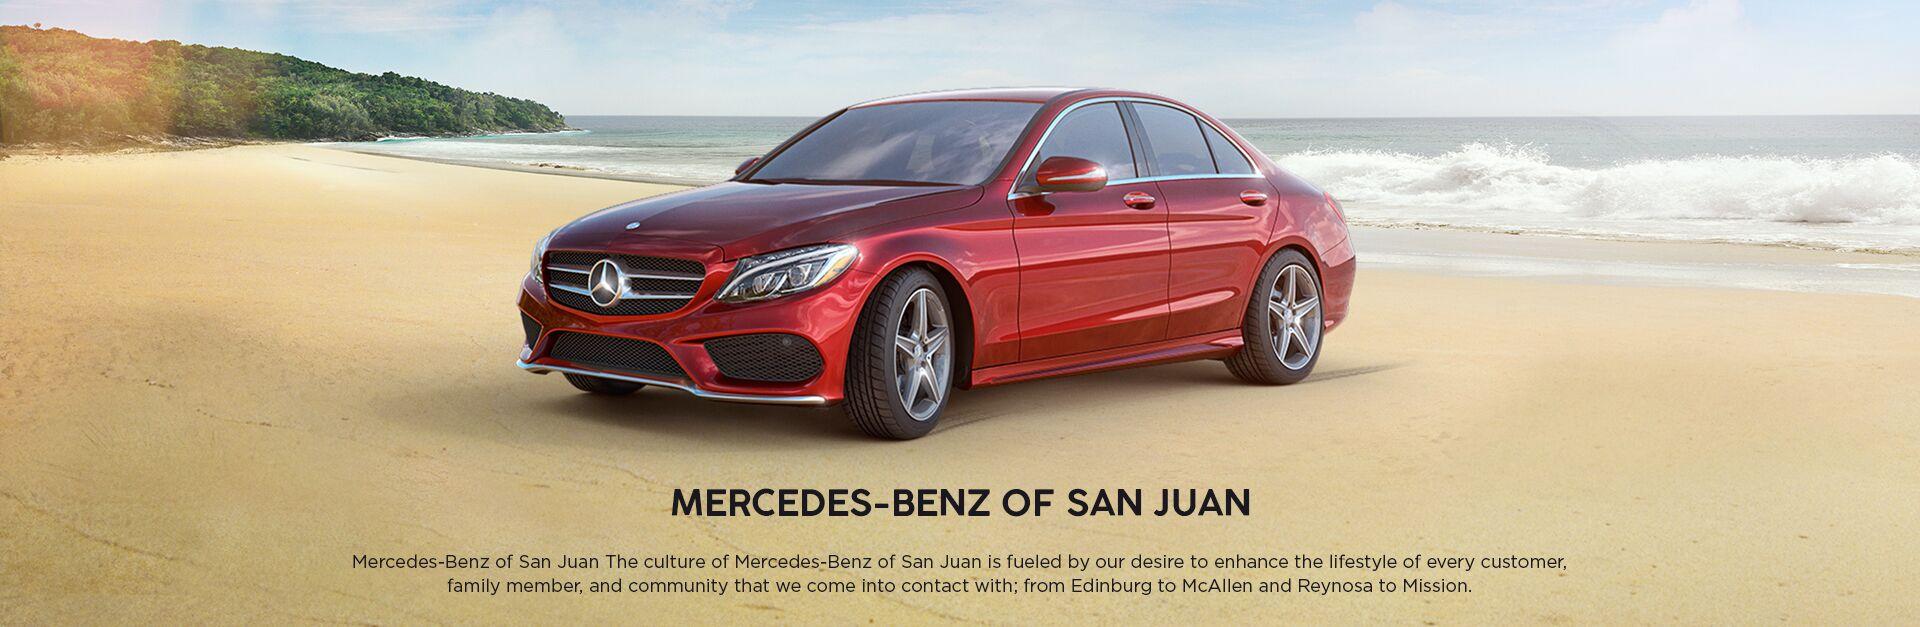 acura jaguar land rover mercedes benz dealership san juan tx used cars south texas luxury. Black Bedroom Furniture Sets. Home Design Ideas